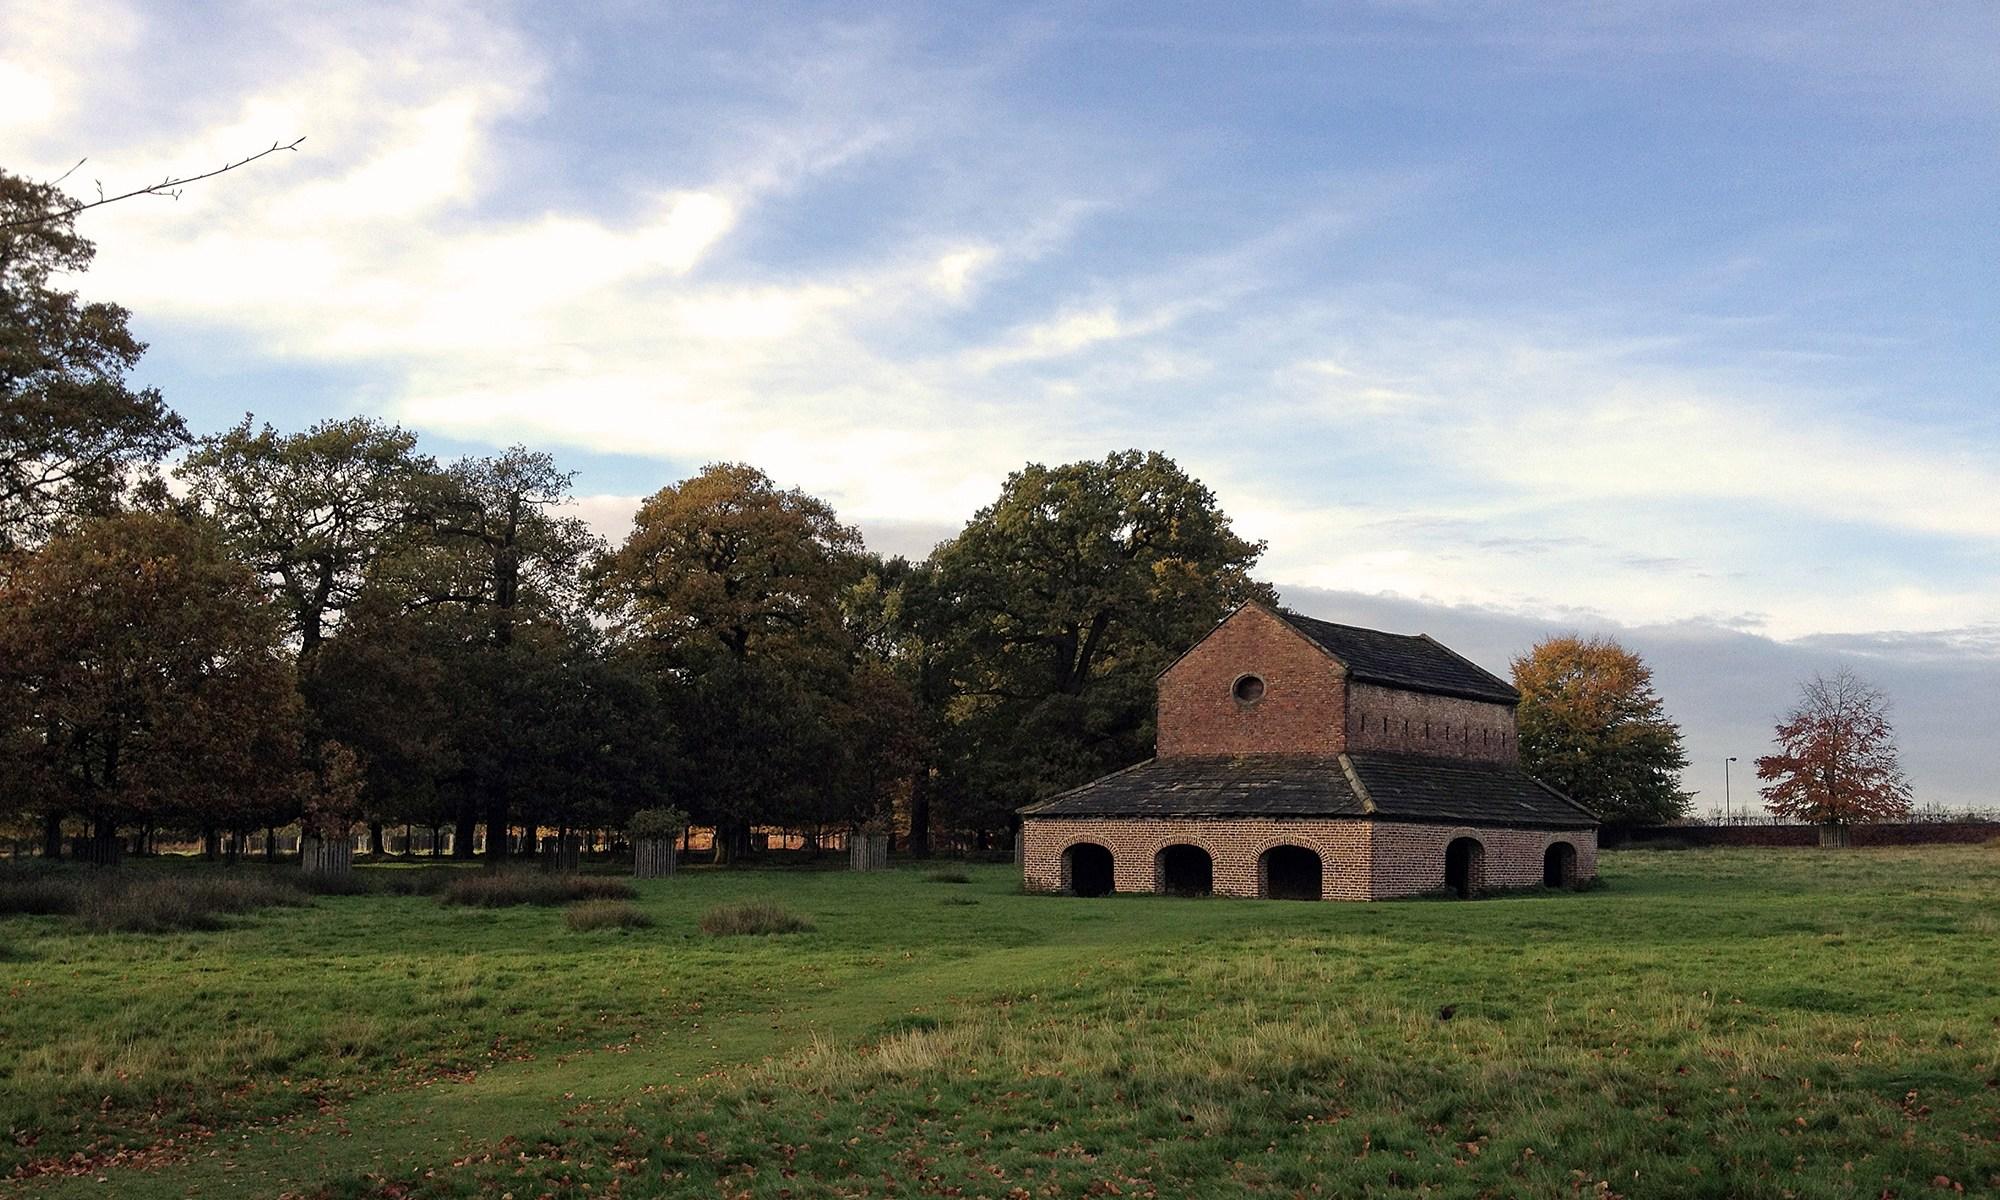 Dunham Massey Barn